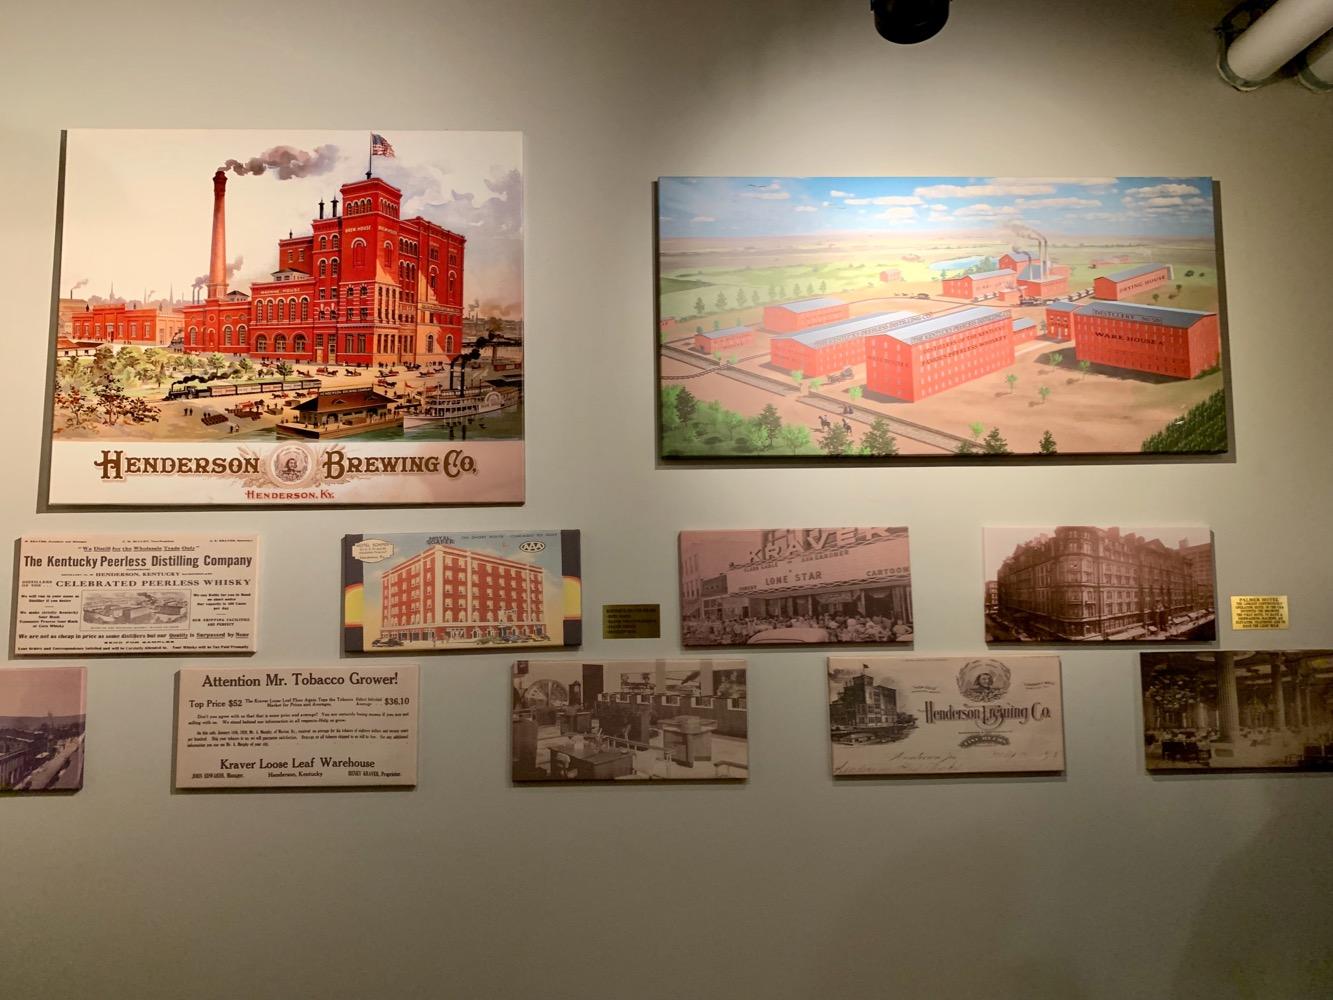 Kentucky Peerless Distilling - History Wall